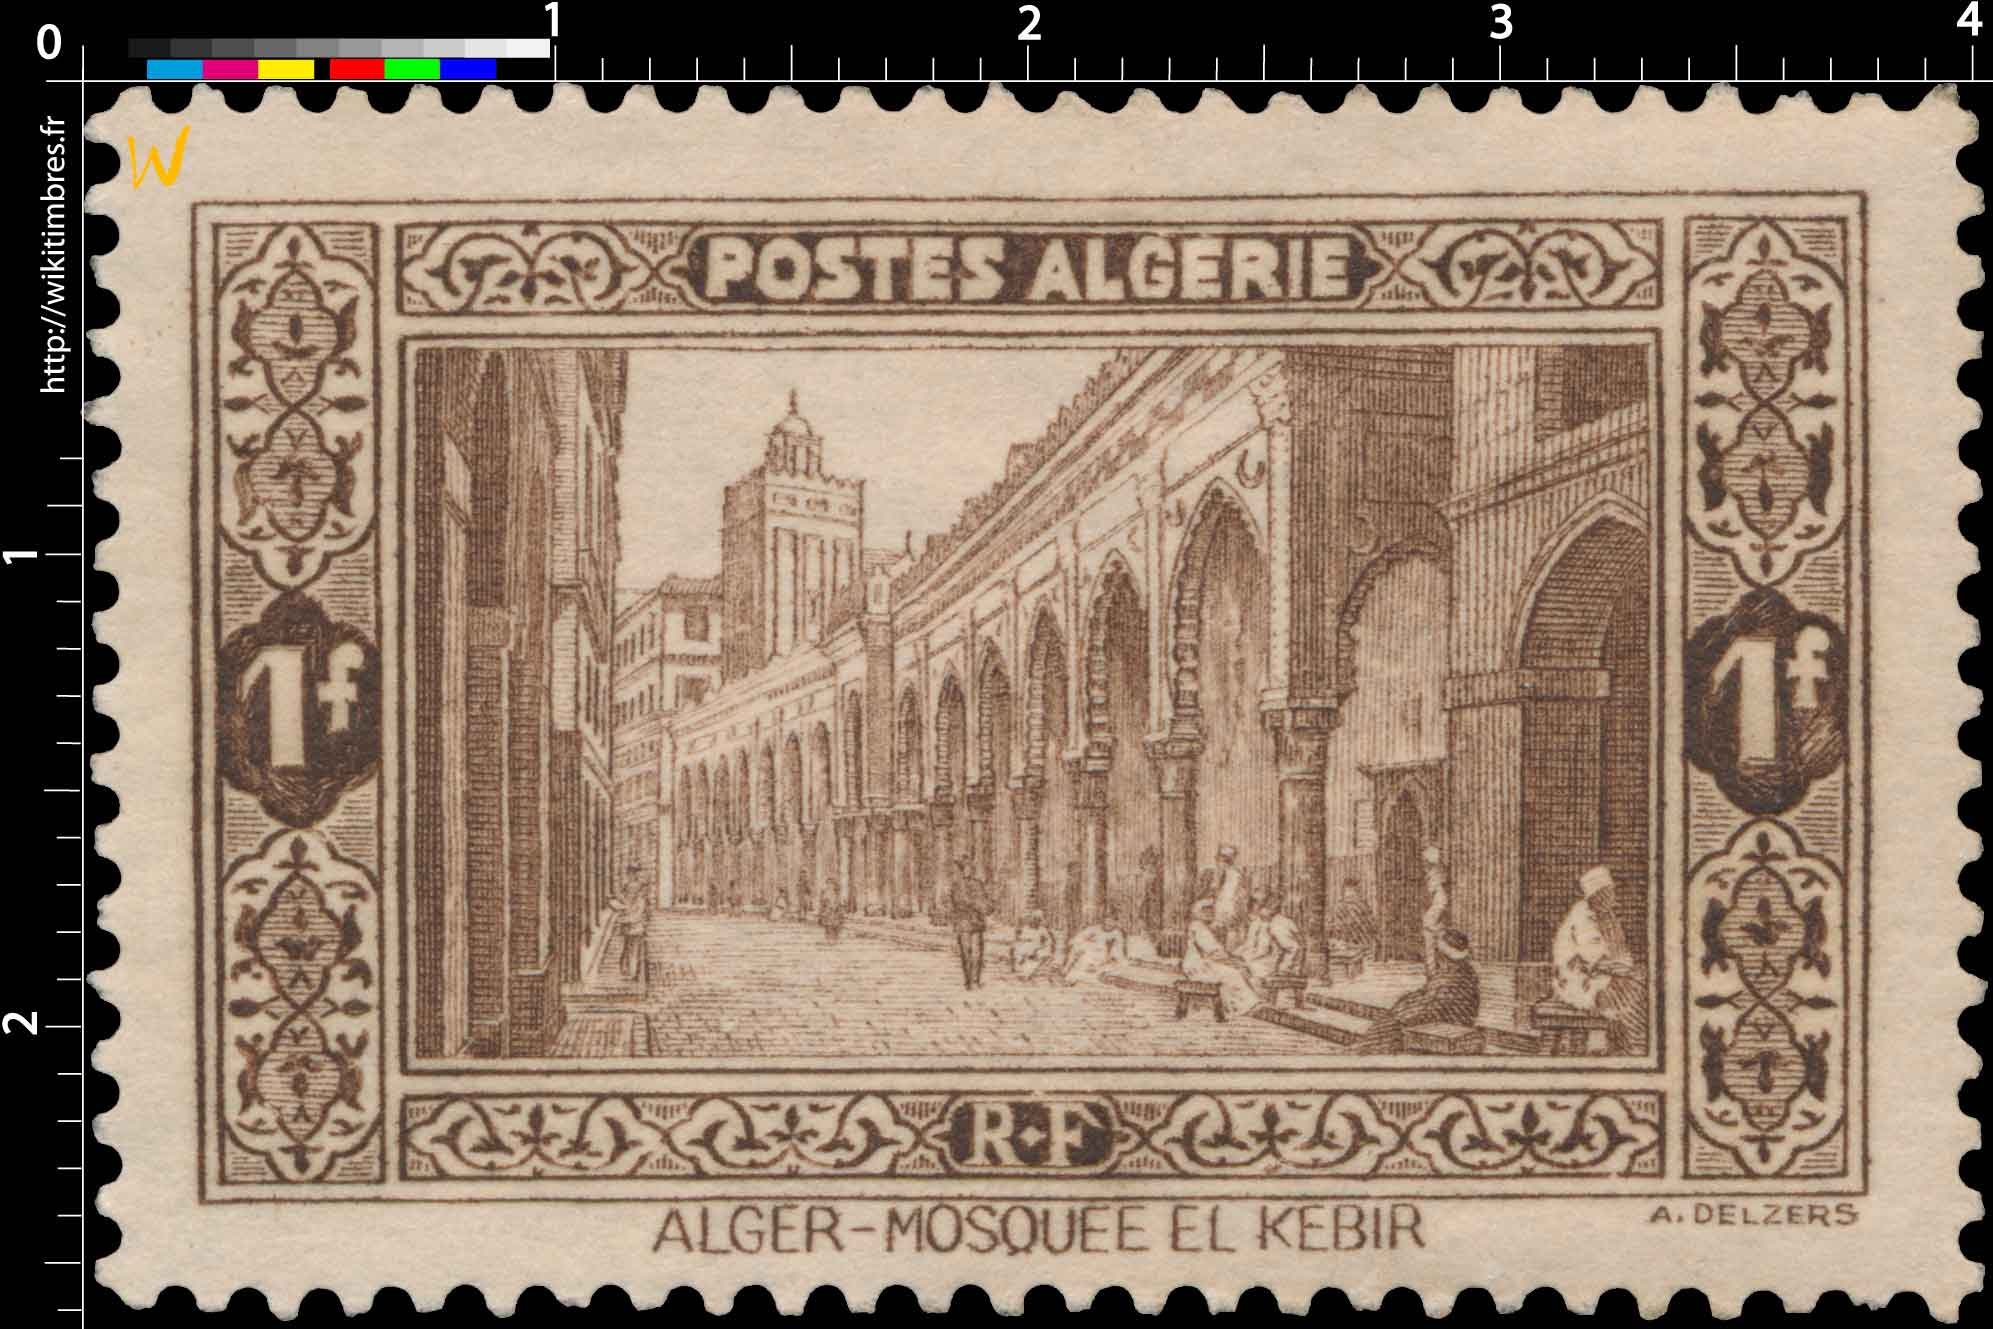 Algérie - Mosquée El Kébir